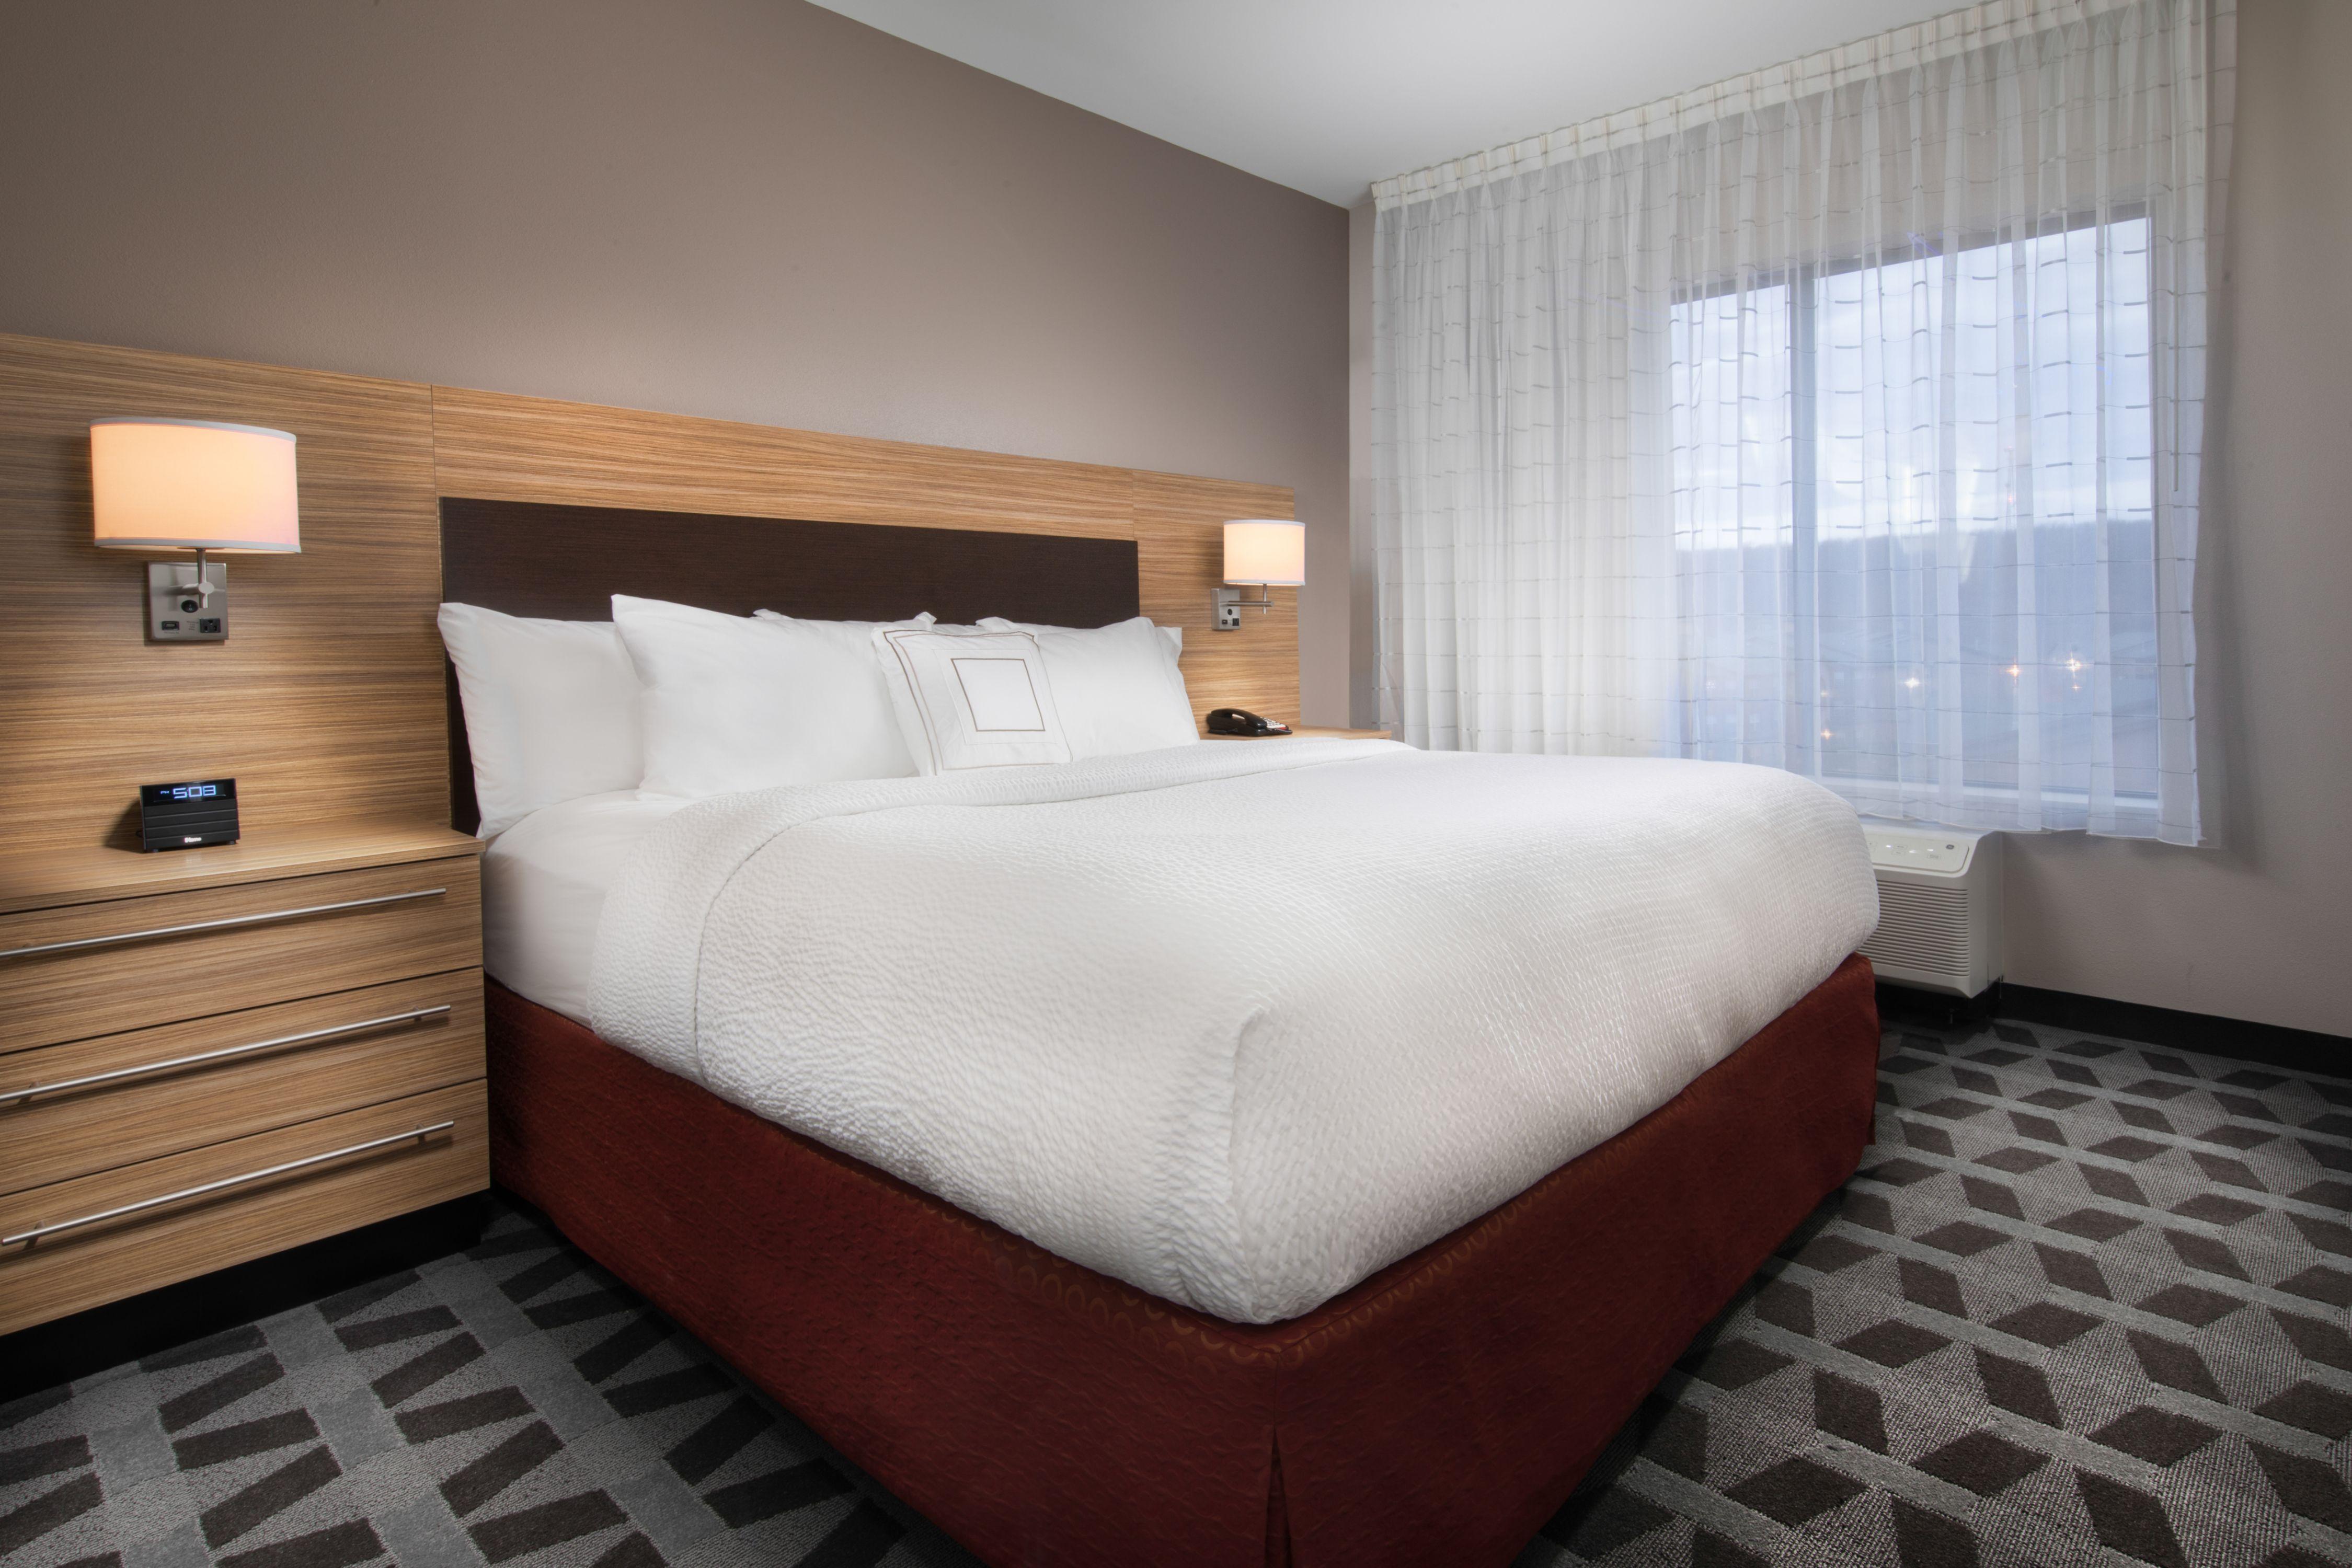 TownePlace Suites by Marriott Nashville Smyrna image 3